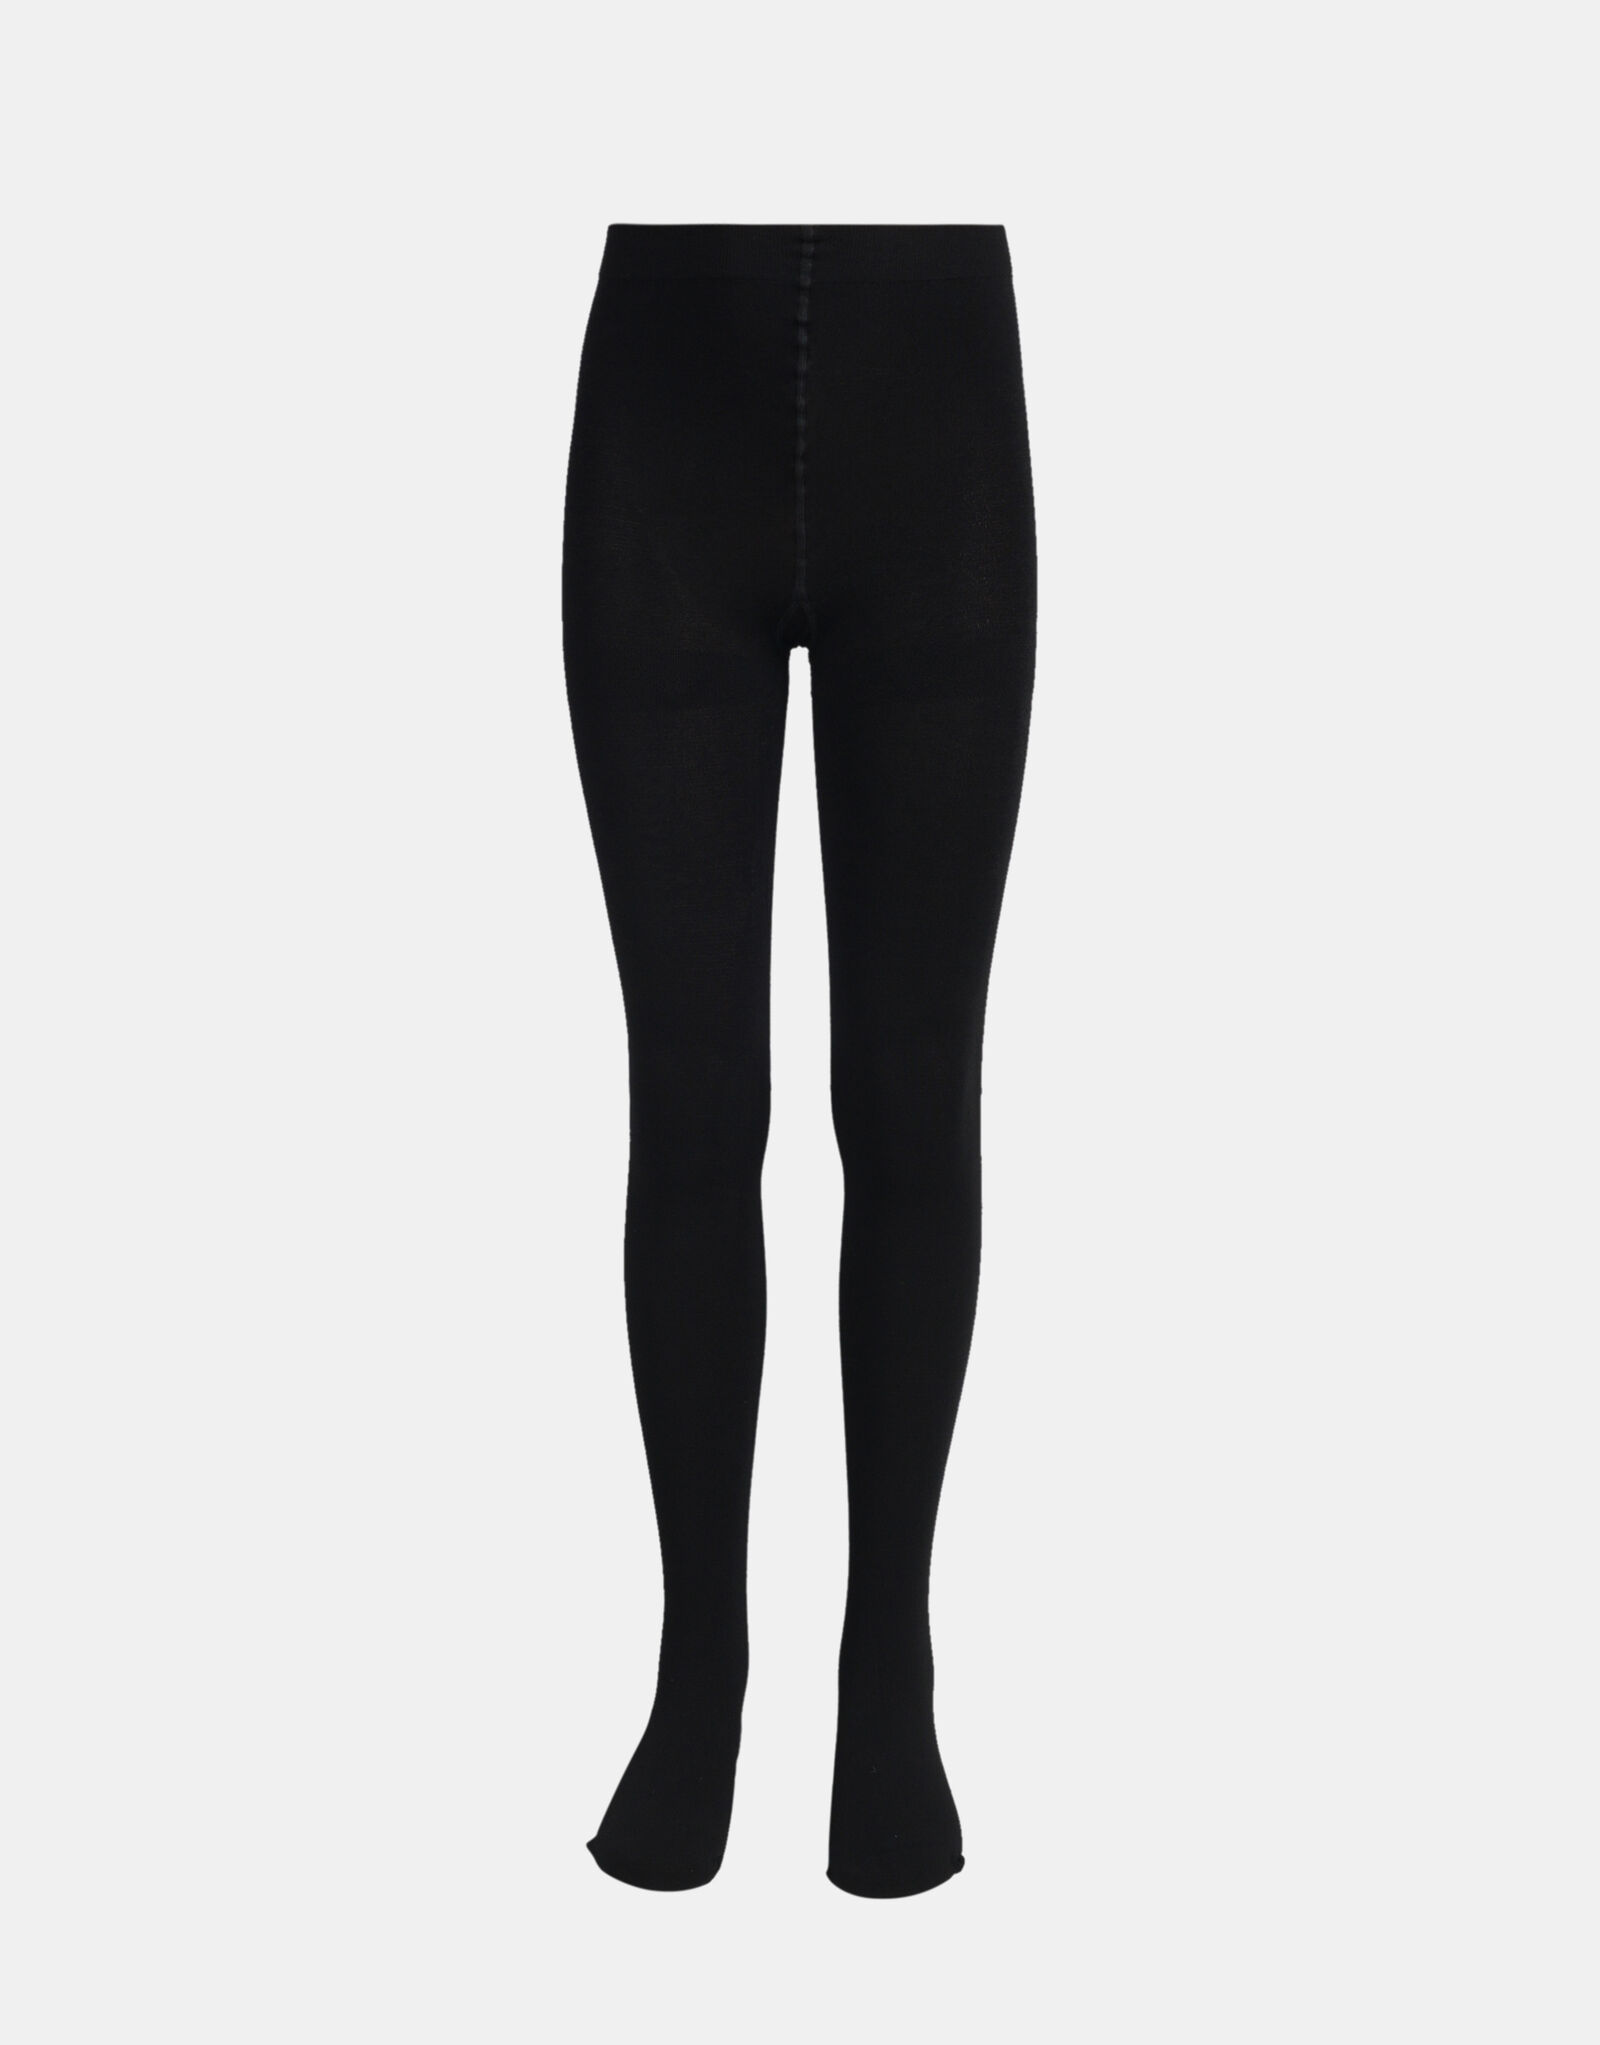 Basic Modal Panty 100 Denier